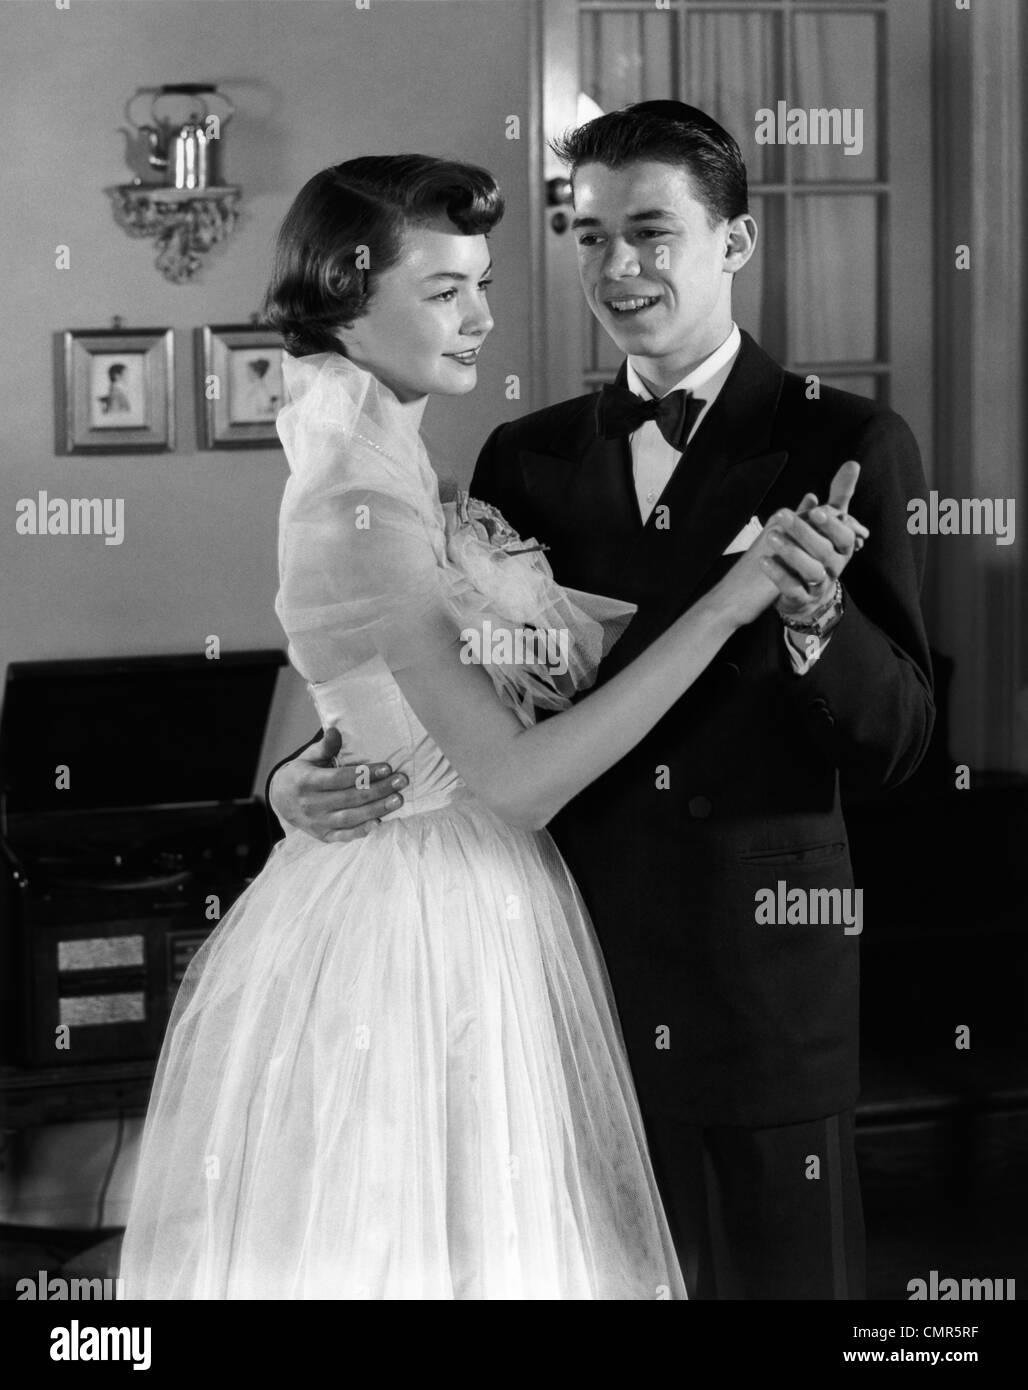 1950s SMILING TEENAGE COUPLE IN FORMAL EVENING WEAR DANCING INDOORS - Stock Image